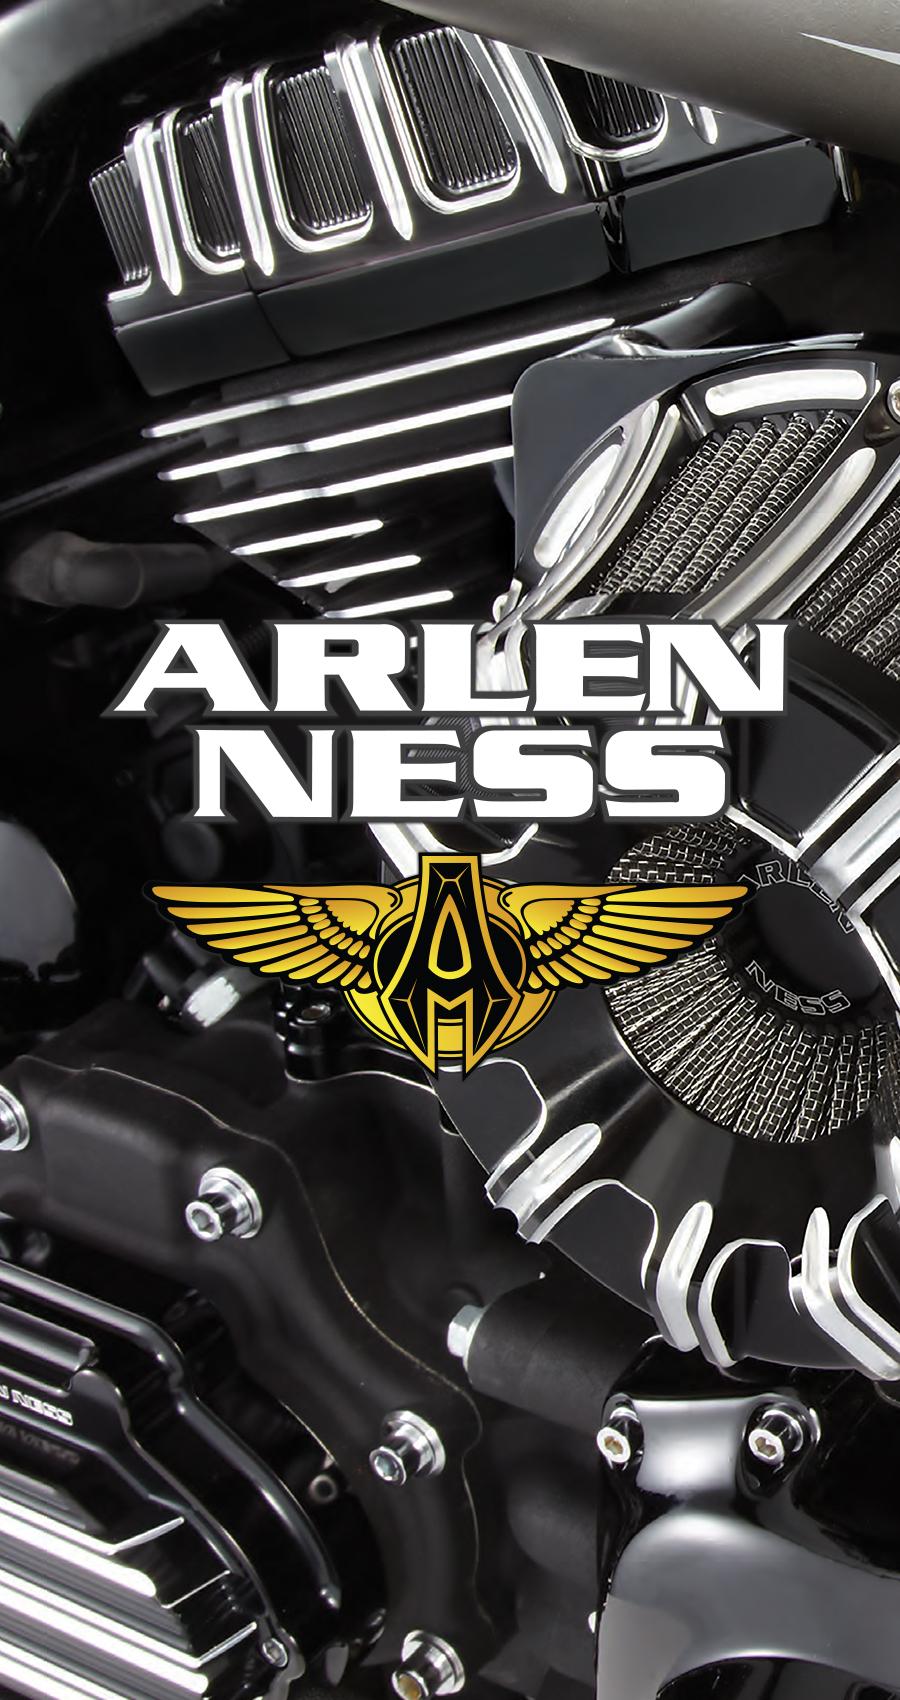 Arlen Ness Sidebar.jpg